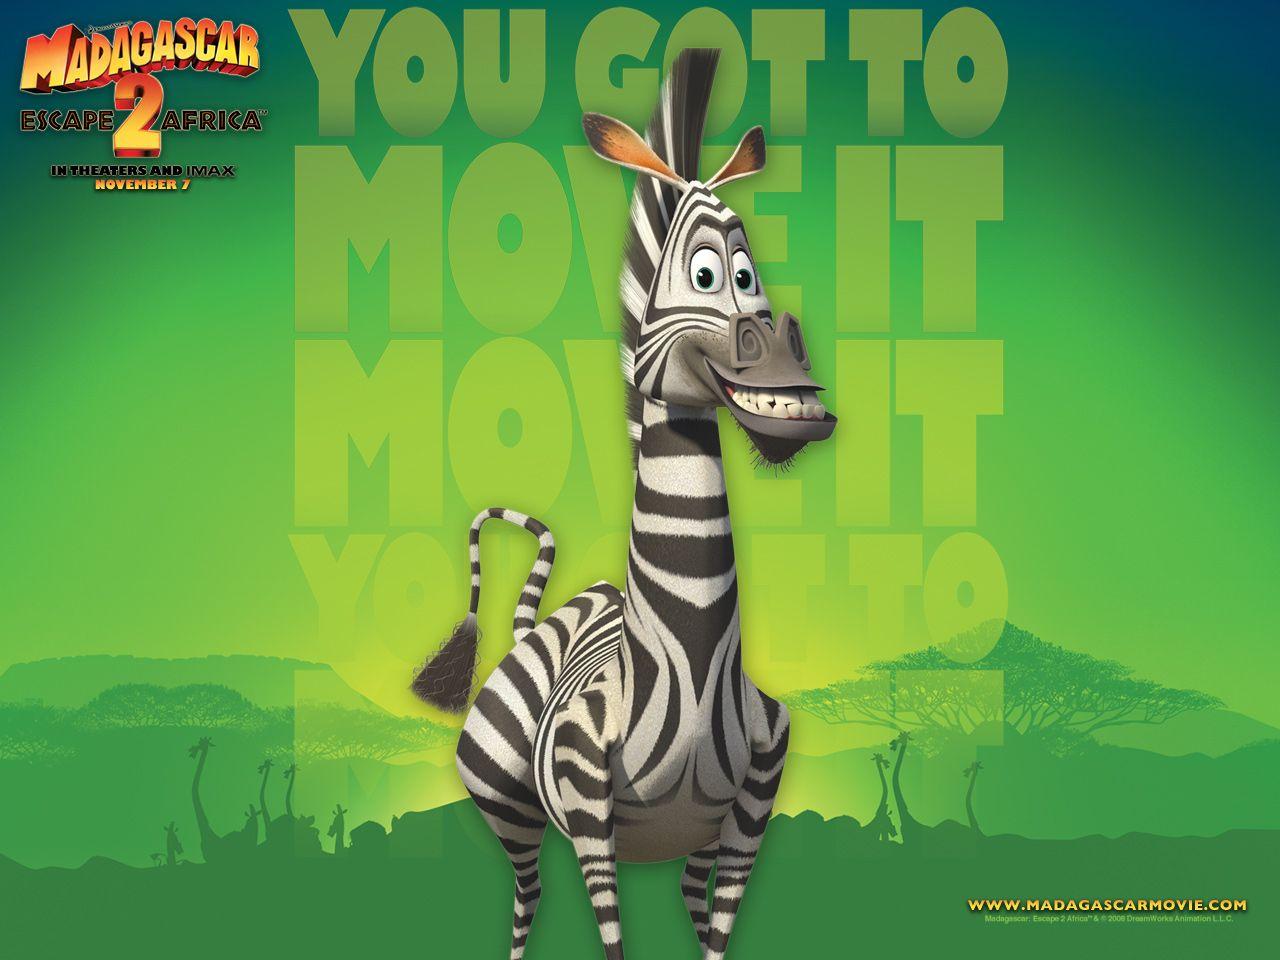 Надписью извини, картинки зебры из мадагаскара